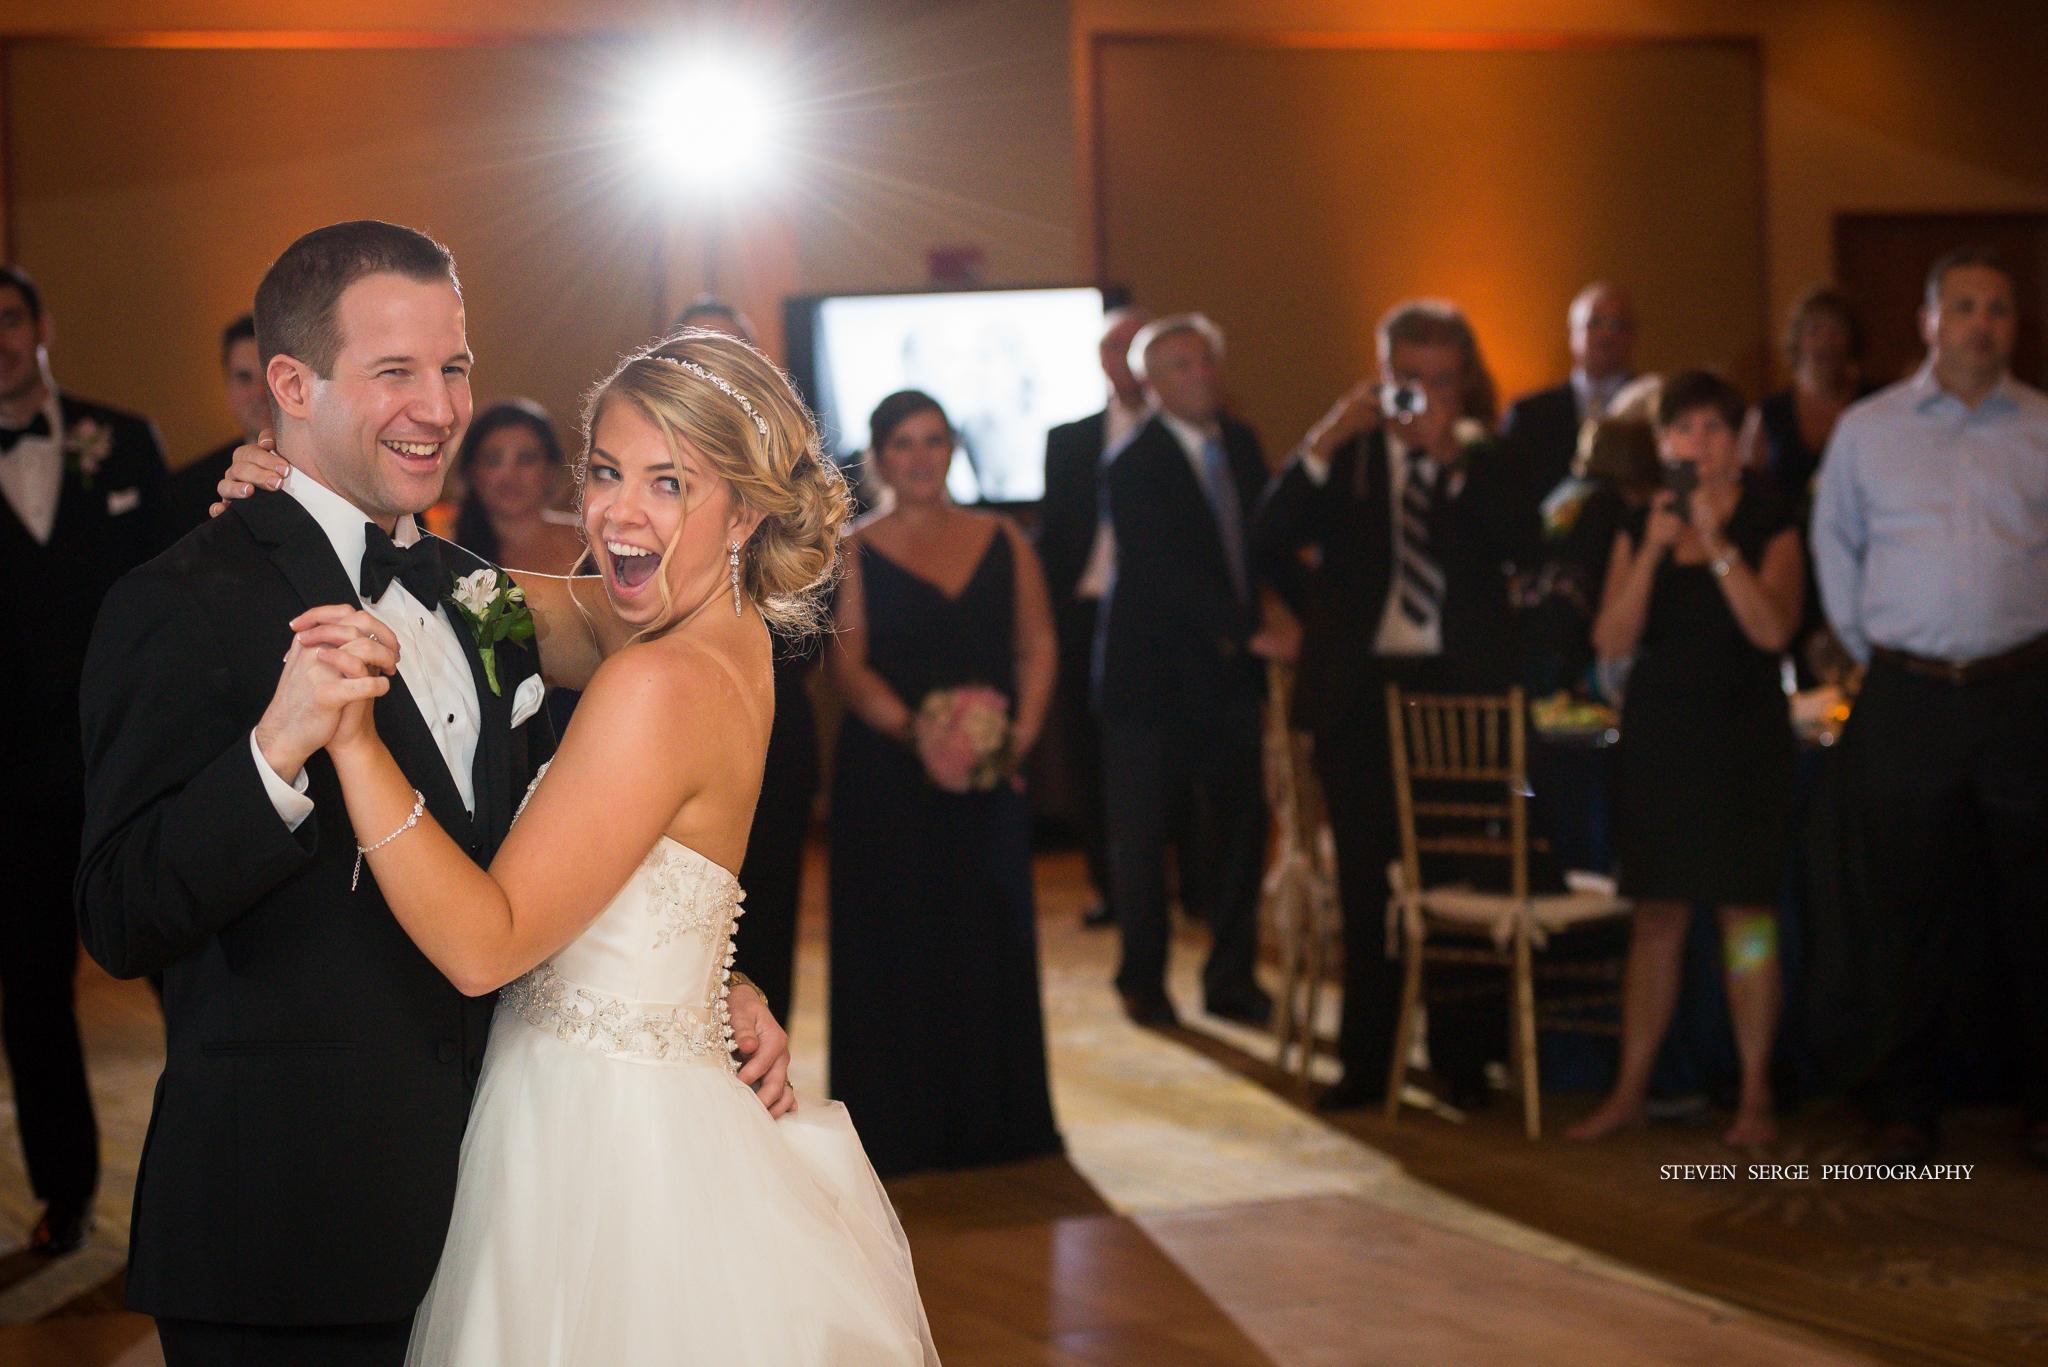 scranton-wedding-photographers-hilton-steven-serge-photography-15.jpg